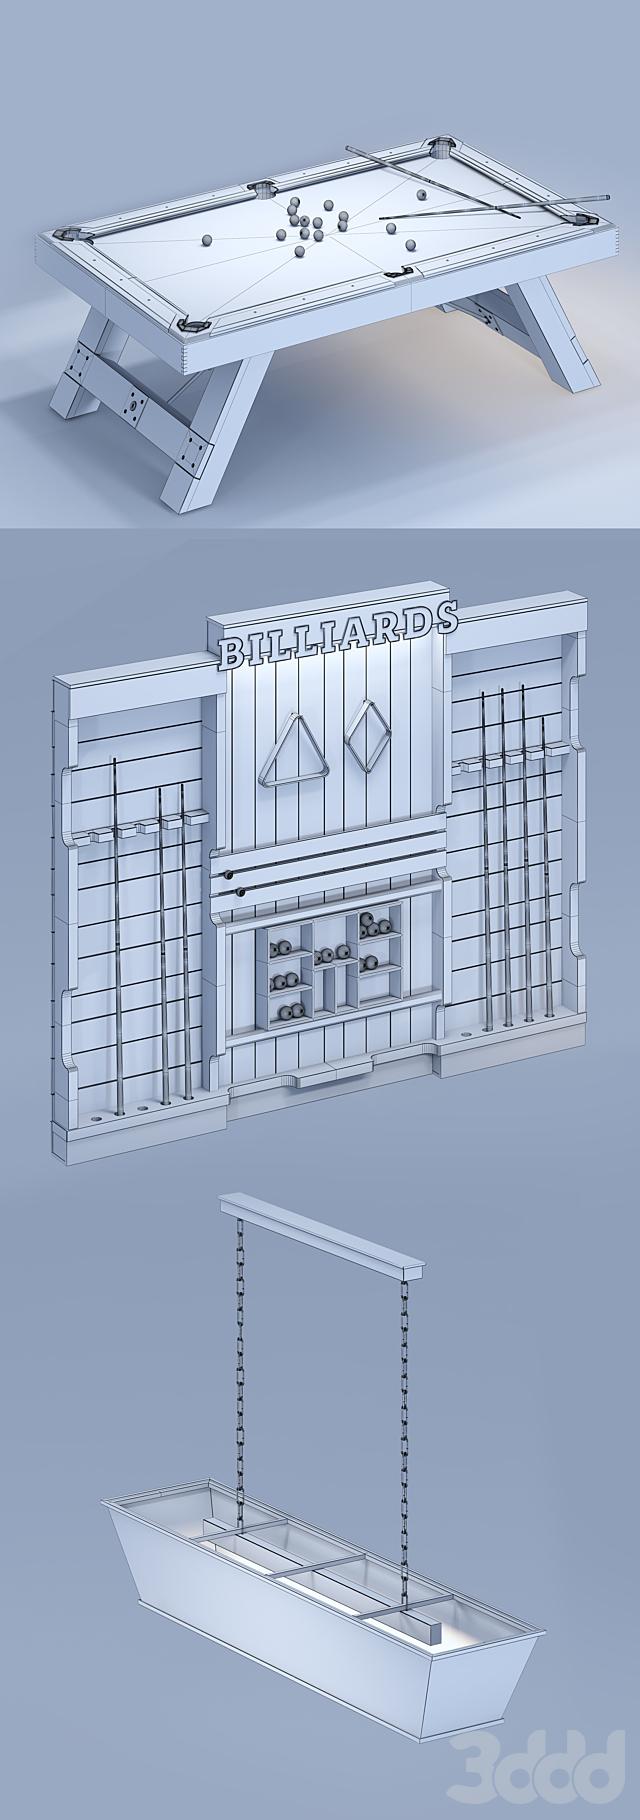 Бильярд BILLIARDS